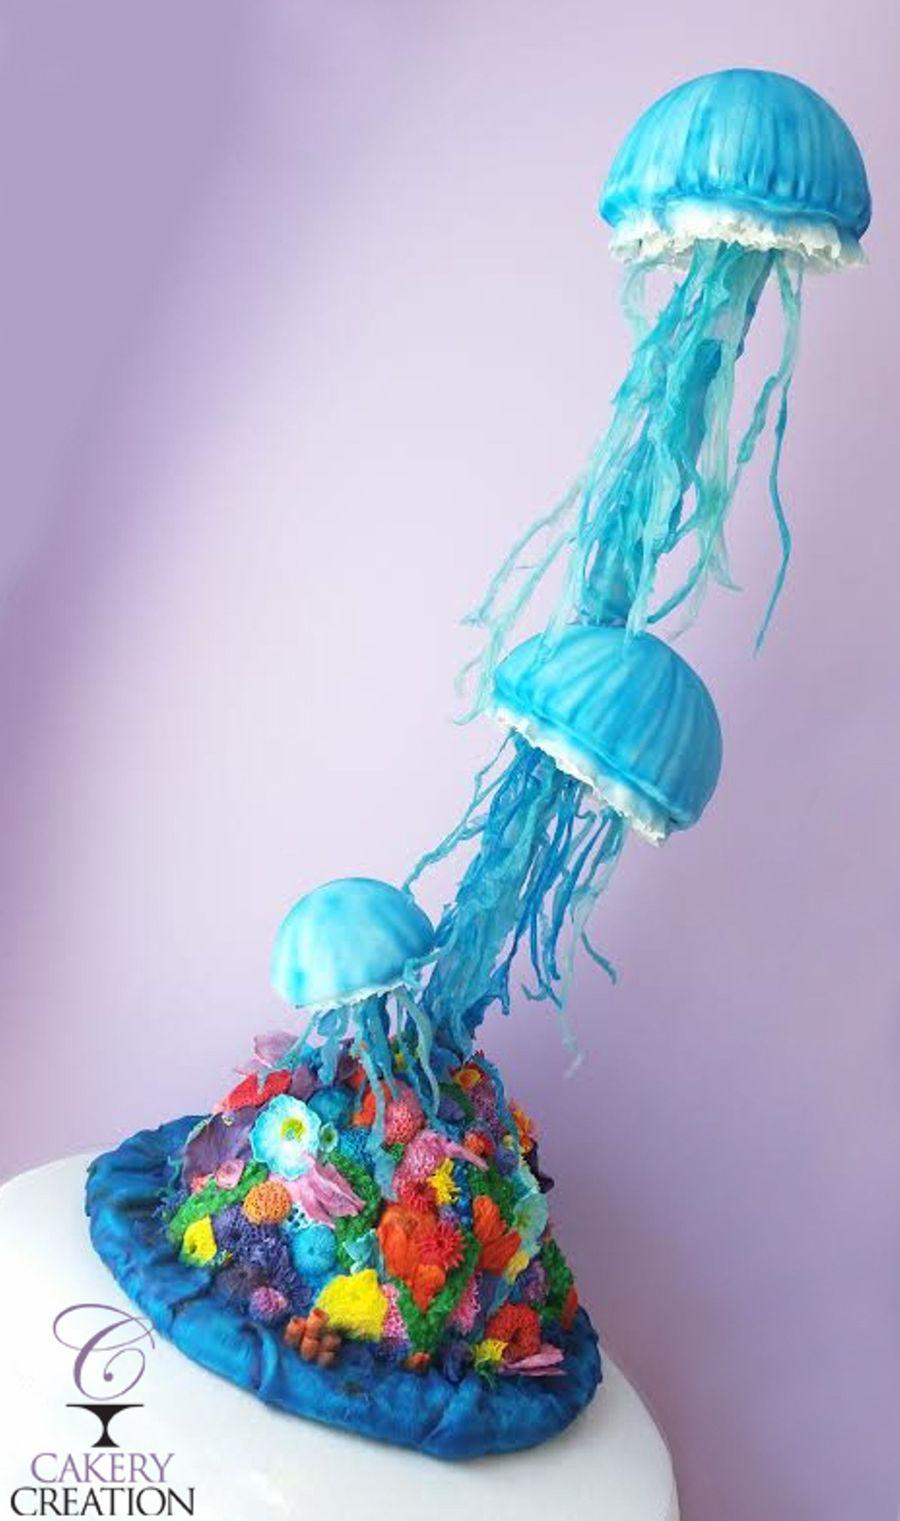 Jellyfish Cake - CakeCentral.com